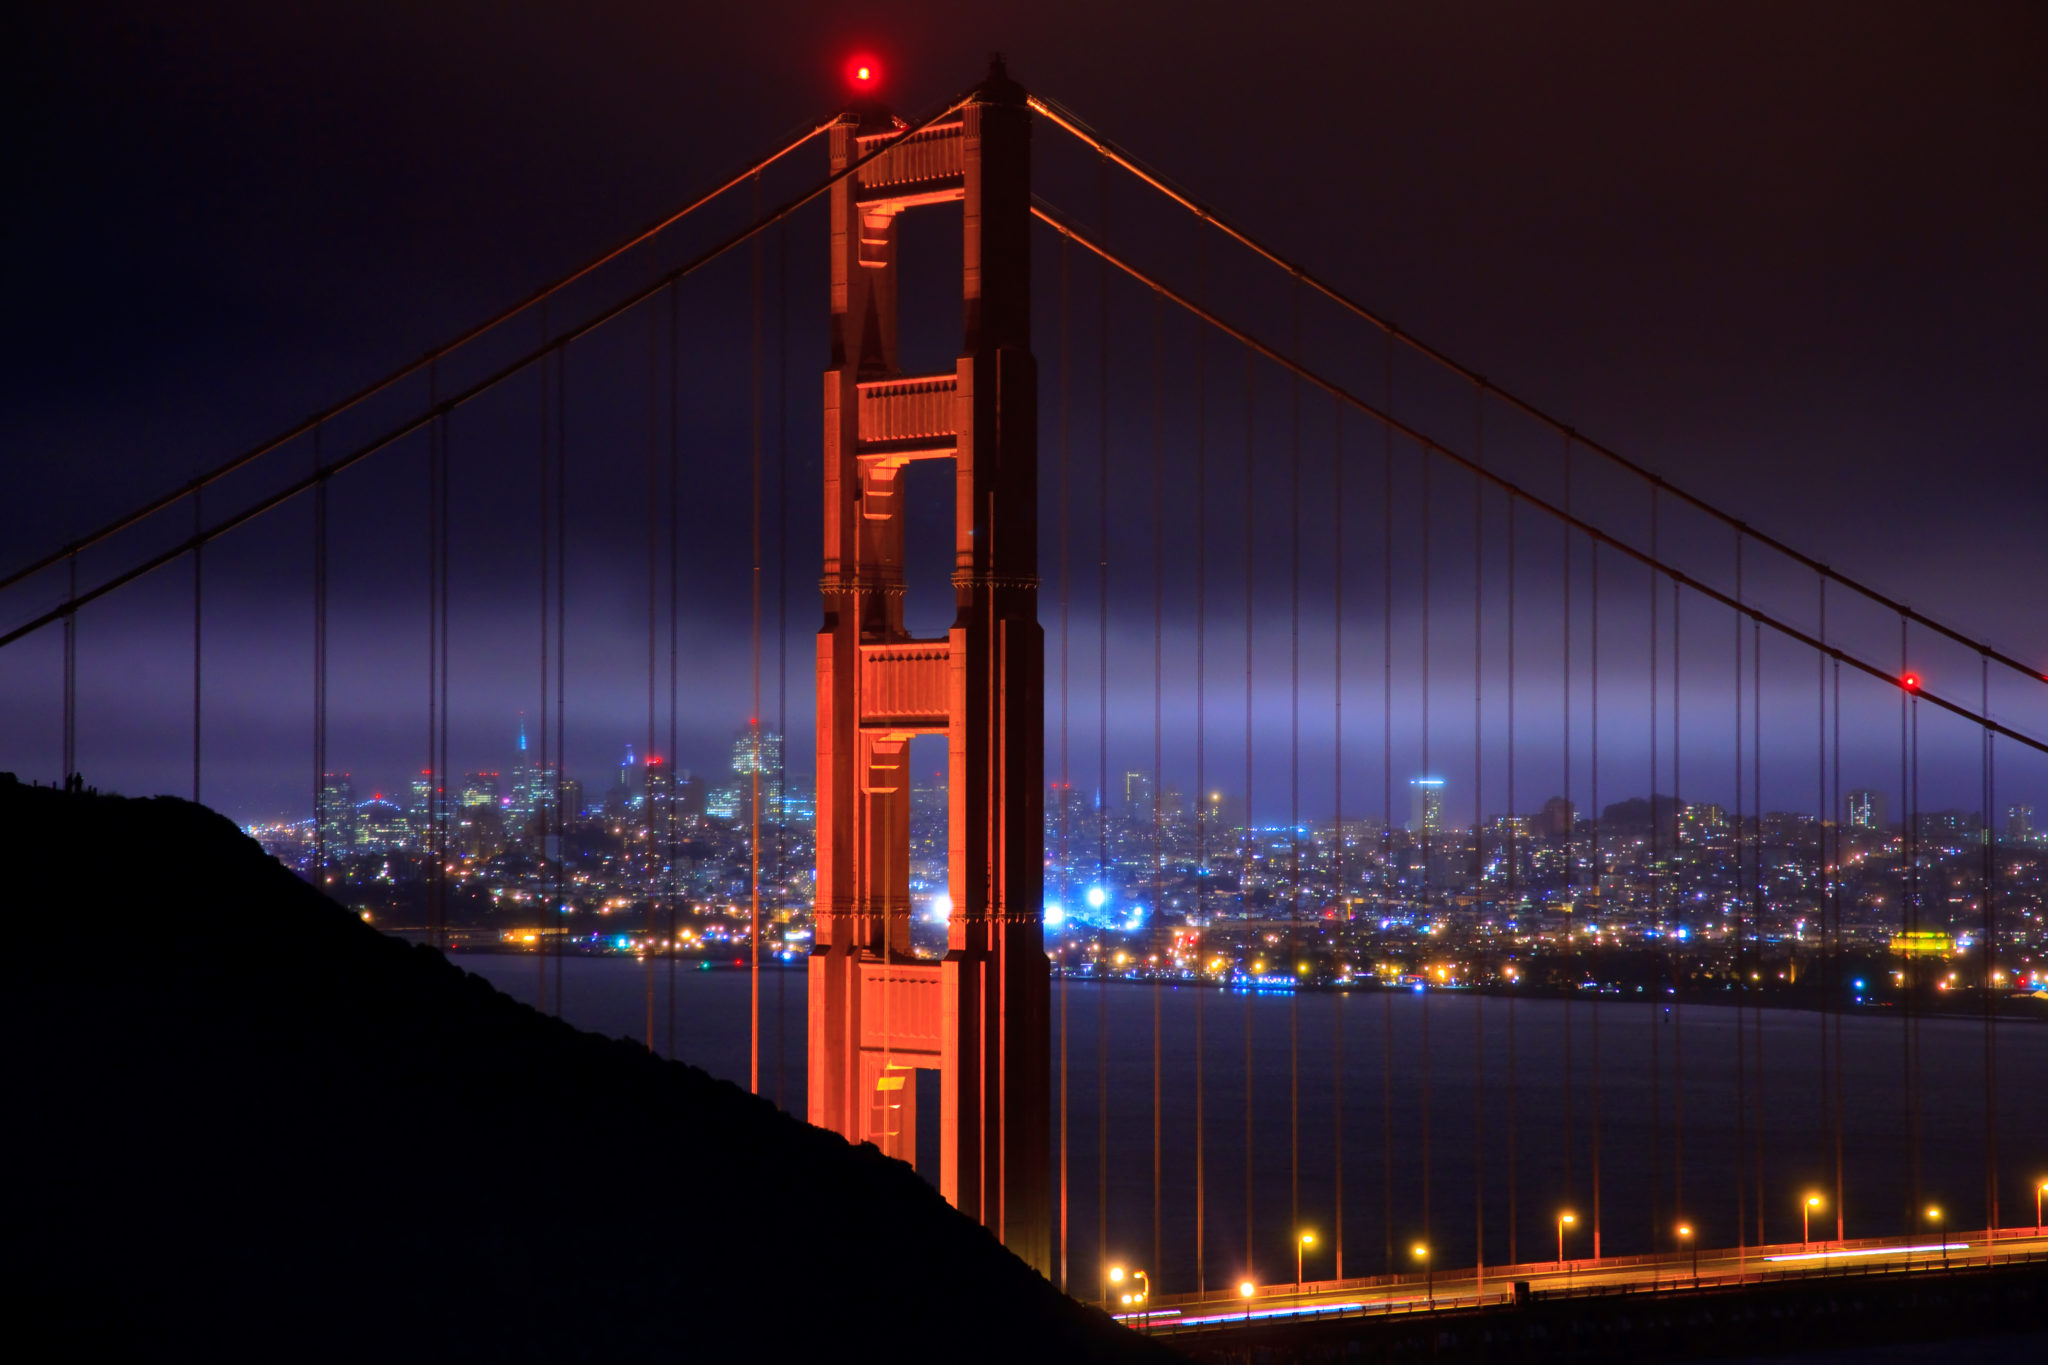 Kilka ciekawostek o San Francisco